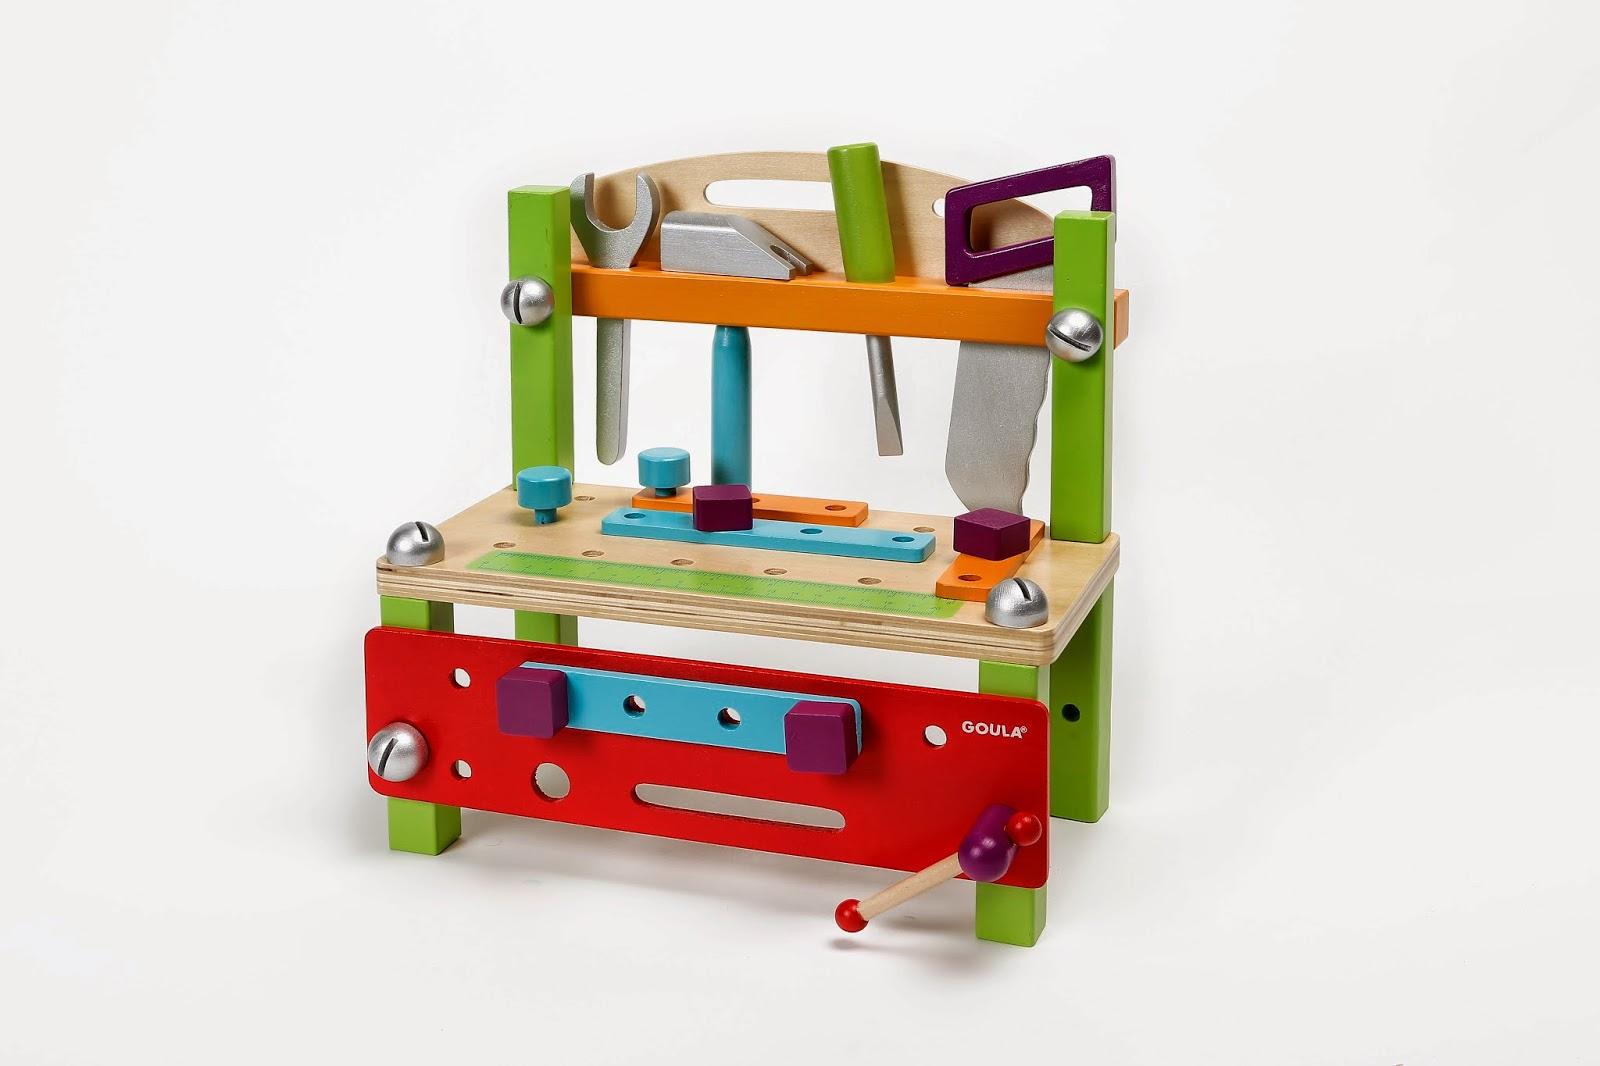 mesa-carpintero-juguete